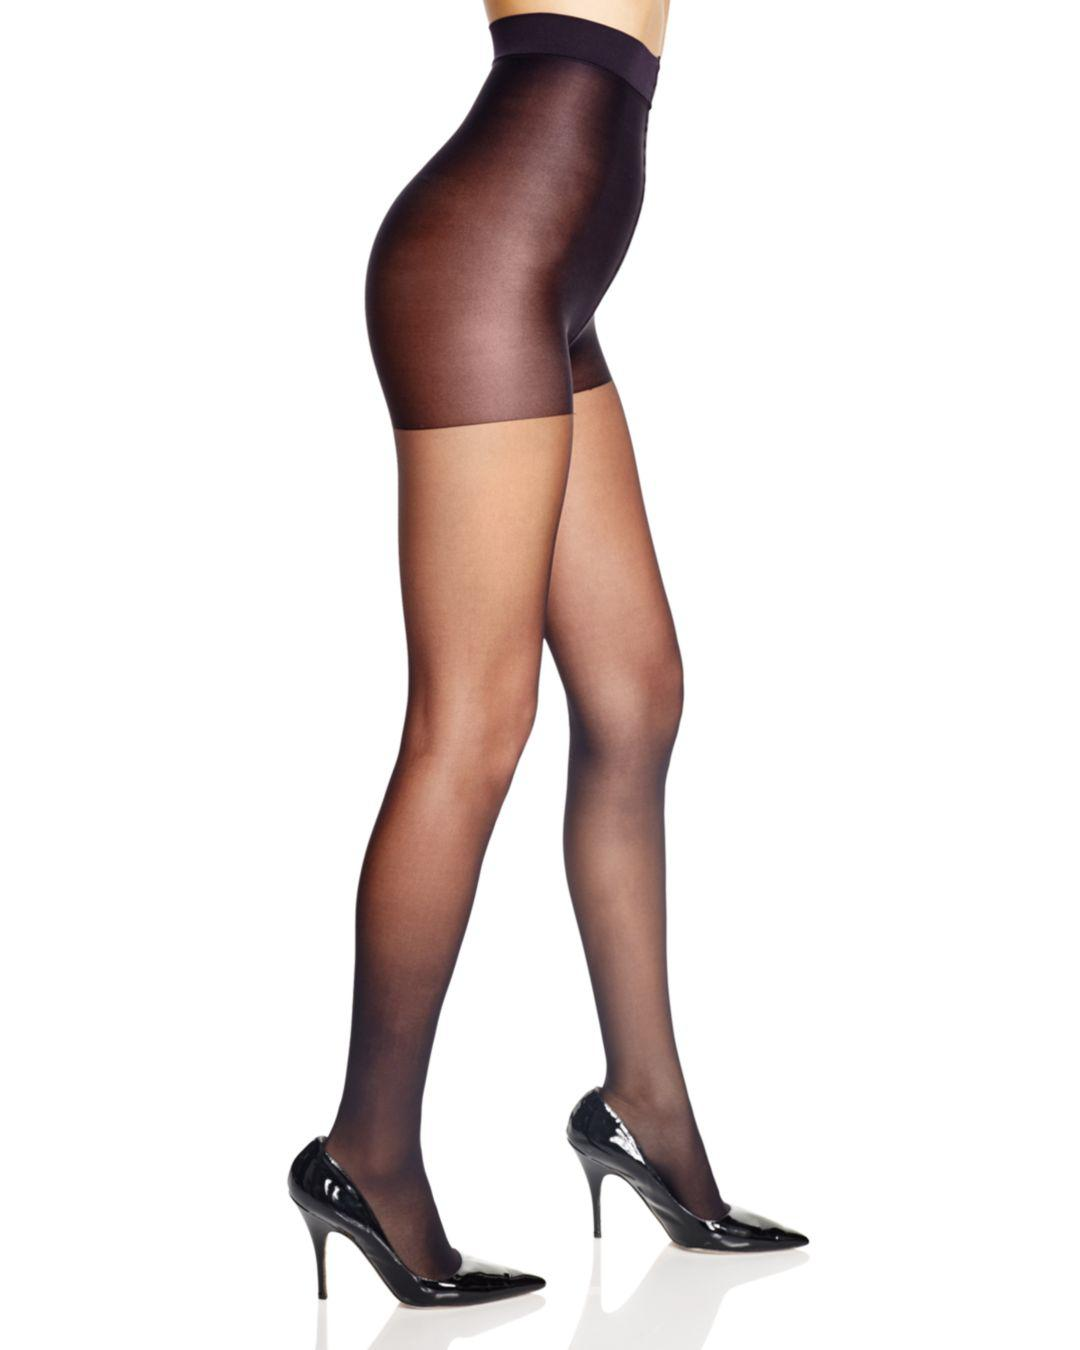 da6d2b9ec0cbc Lyst - Calvin Klein Matte Sheer Control Top Tights in Black